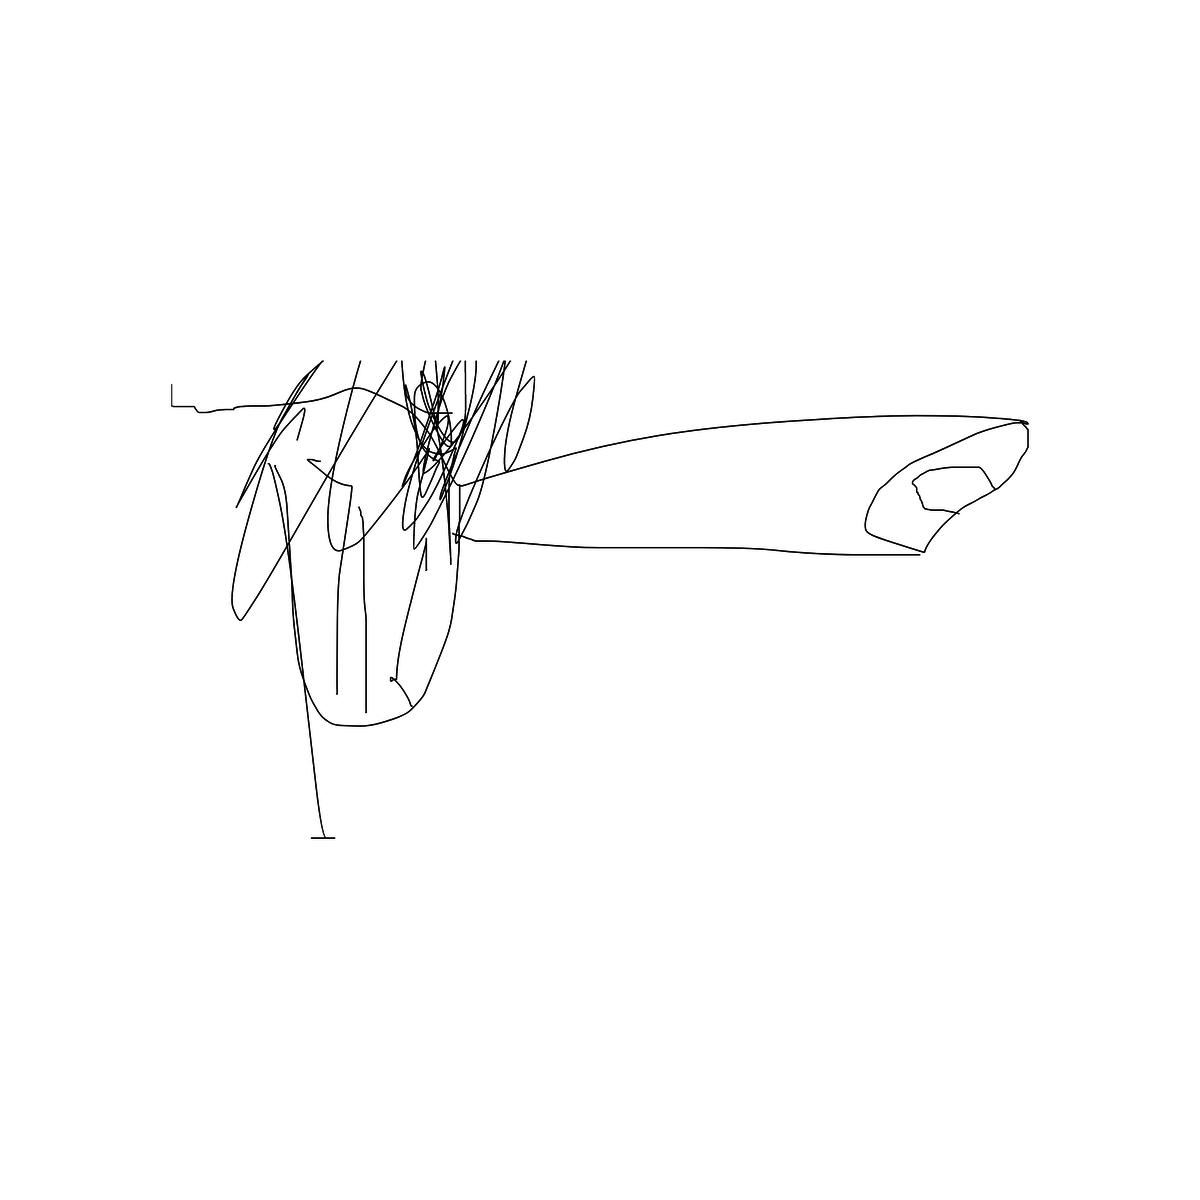 BAAAM drawing#23020 lat:52.2975273132324200lng: 4.8407387733459470